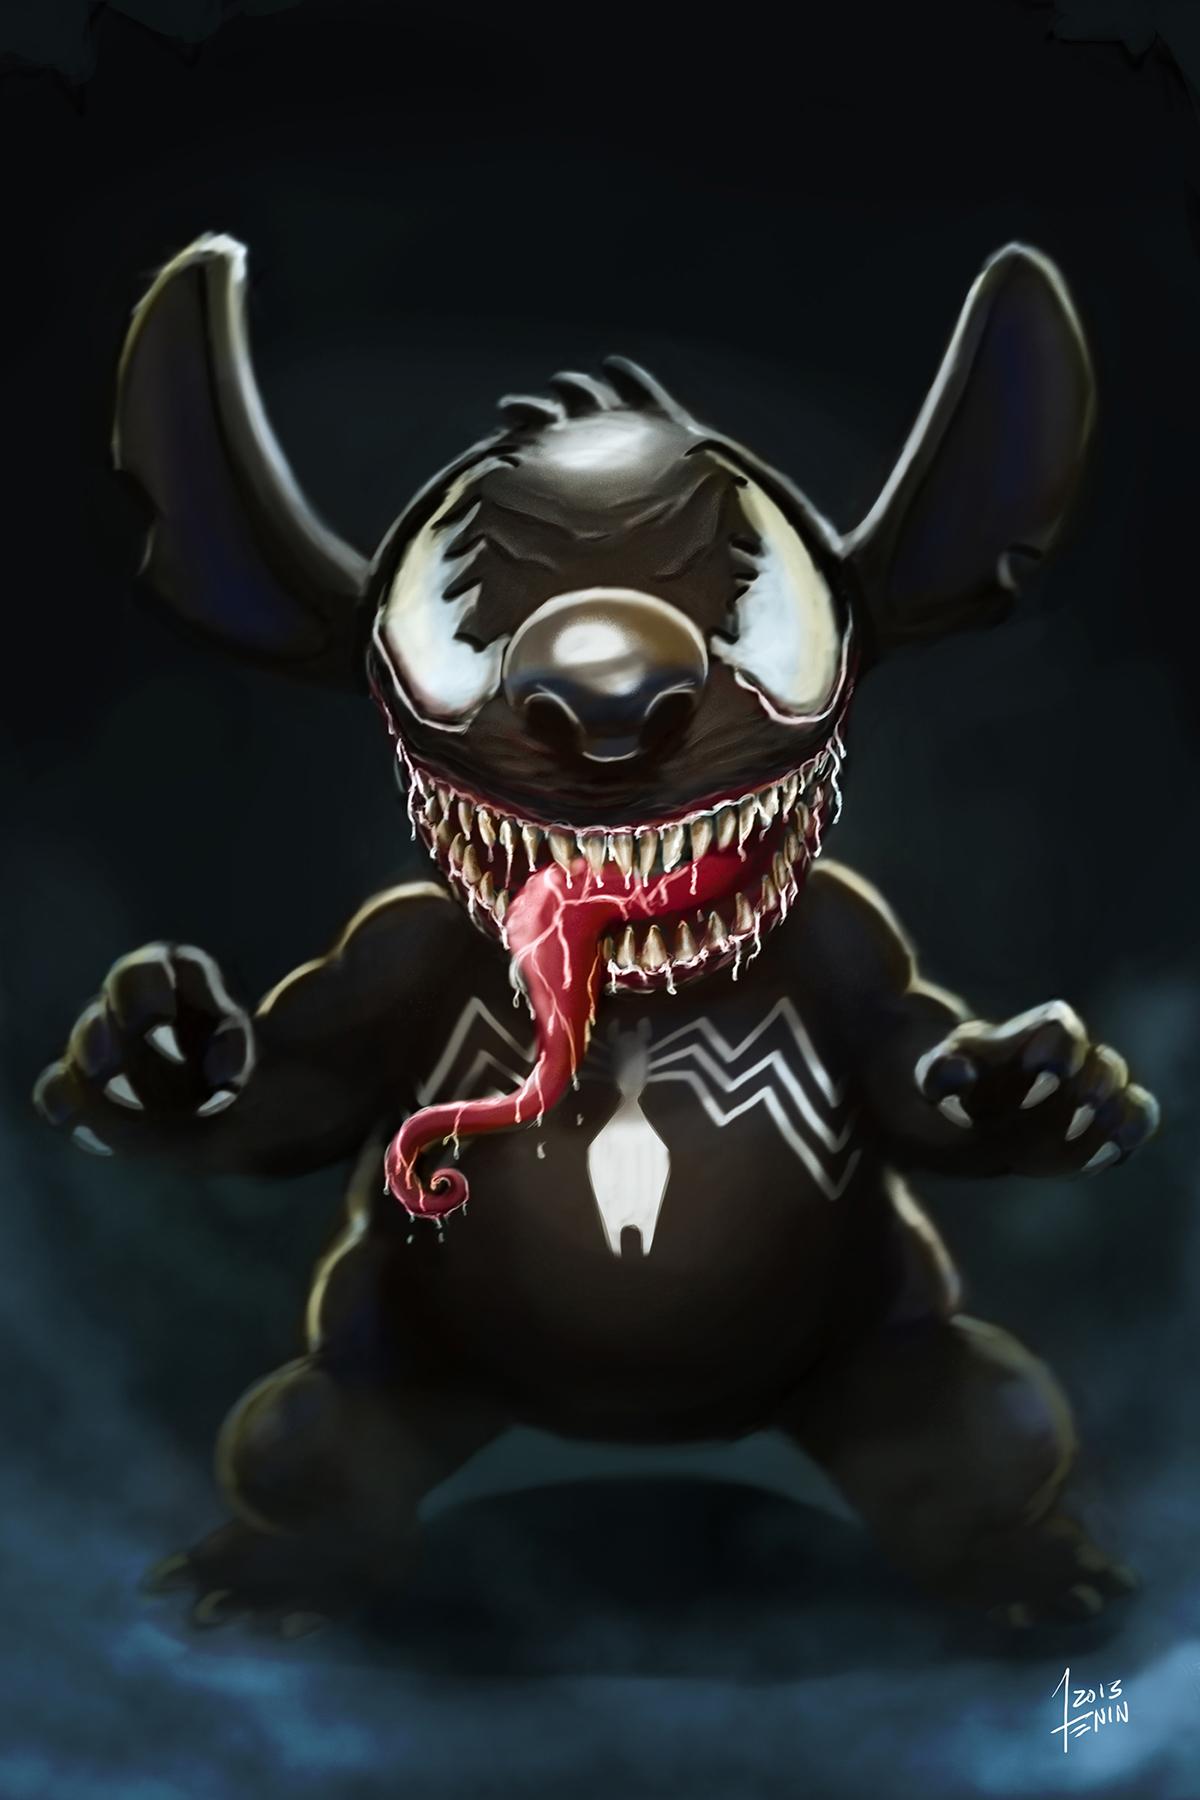 Venom Supreme, a Mashup of Superman and Venom.